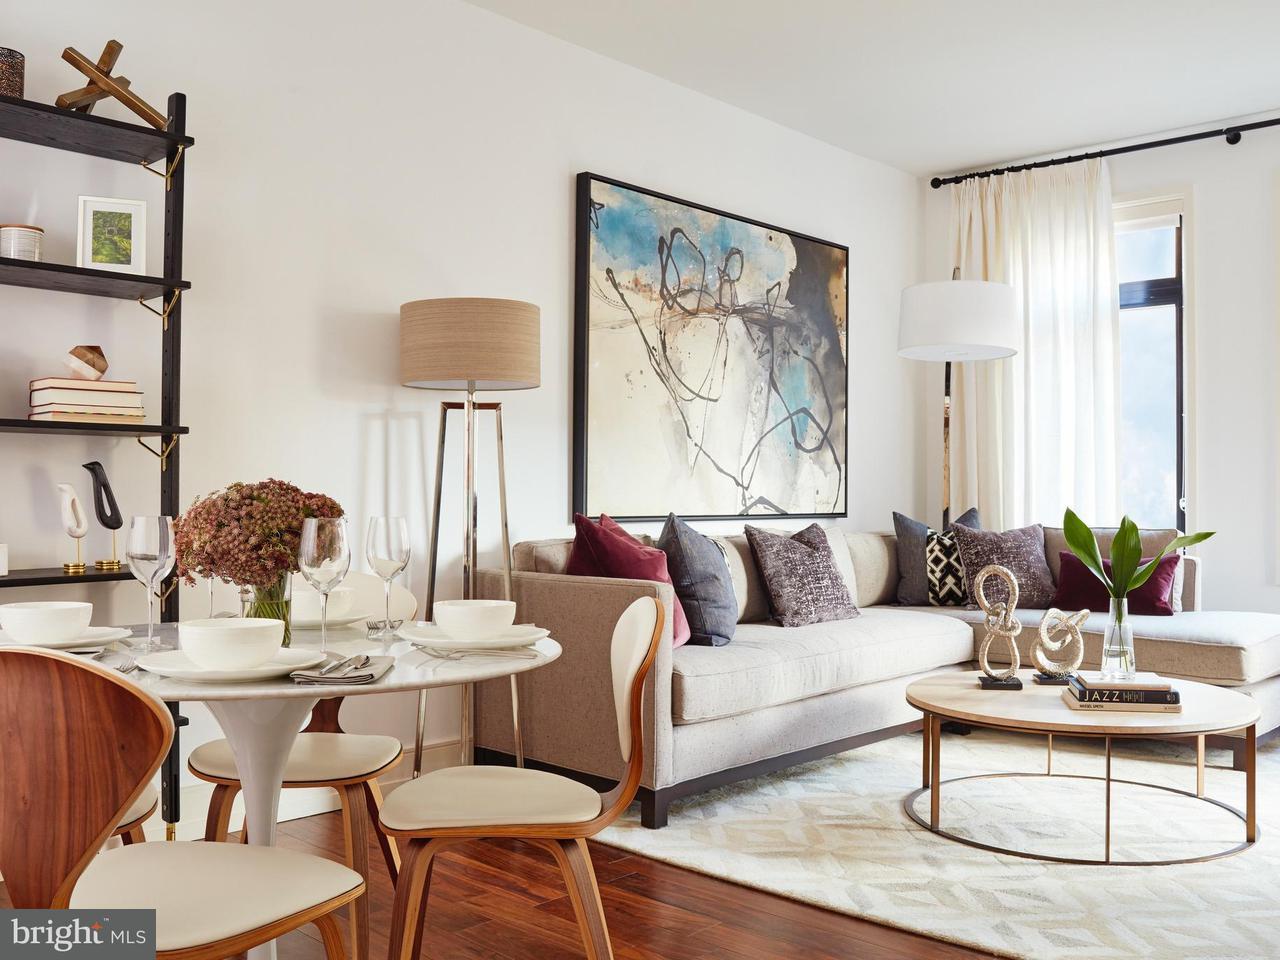 Condominium for Rent at 1310 U St NW #216 Washington, District Of Columbia 20009 United States